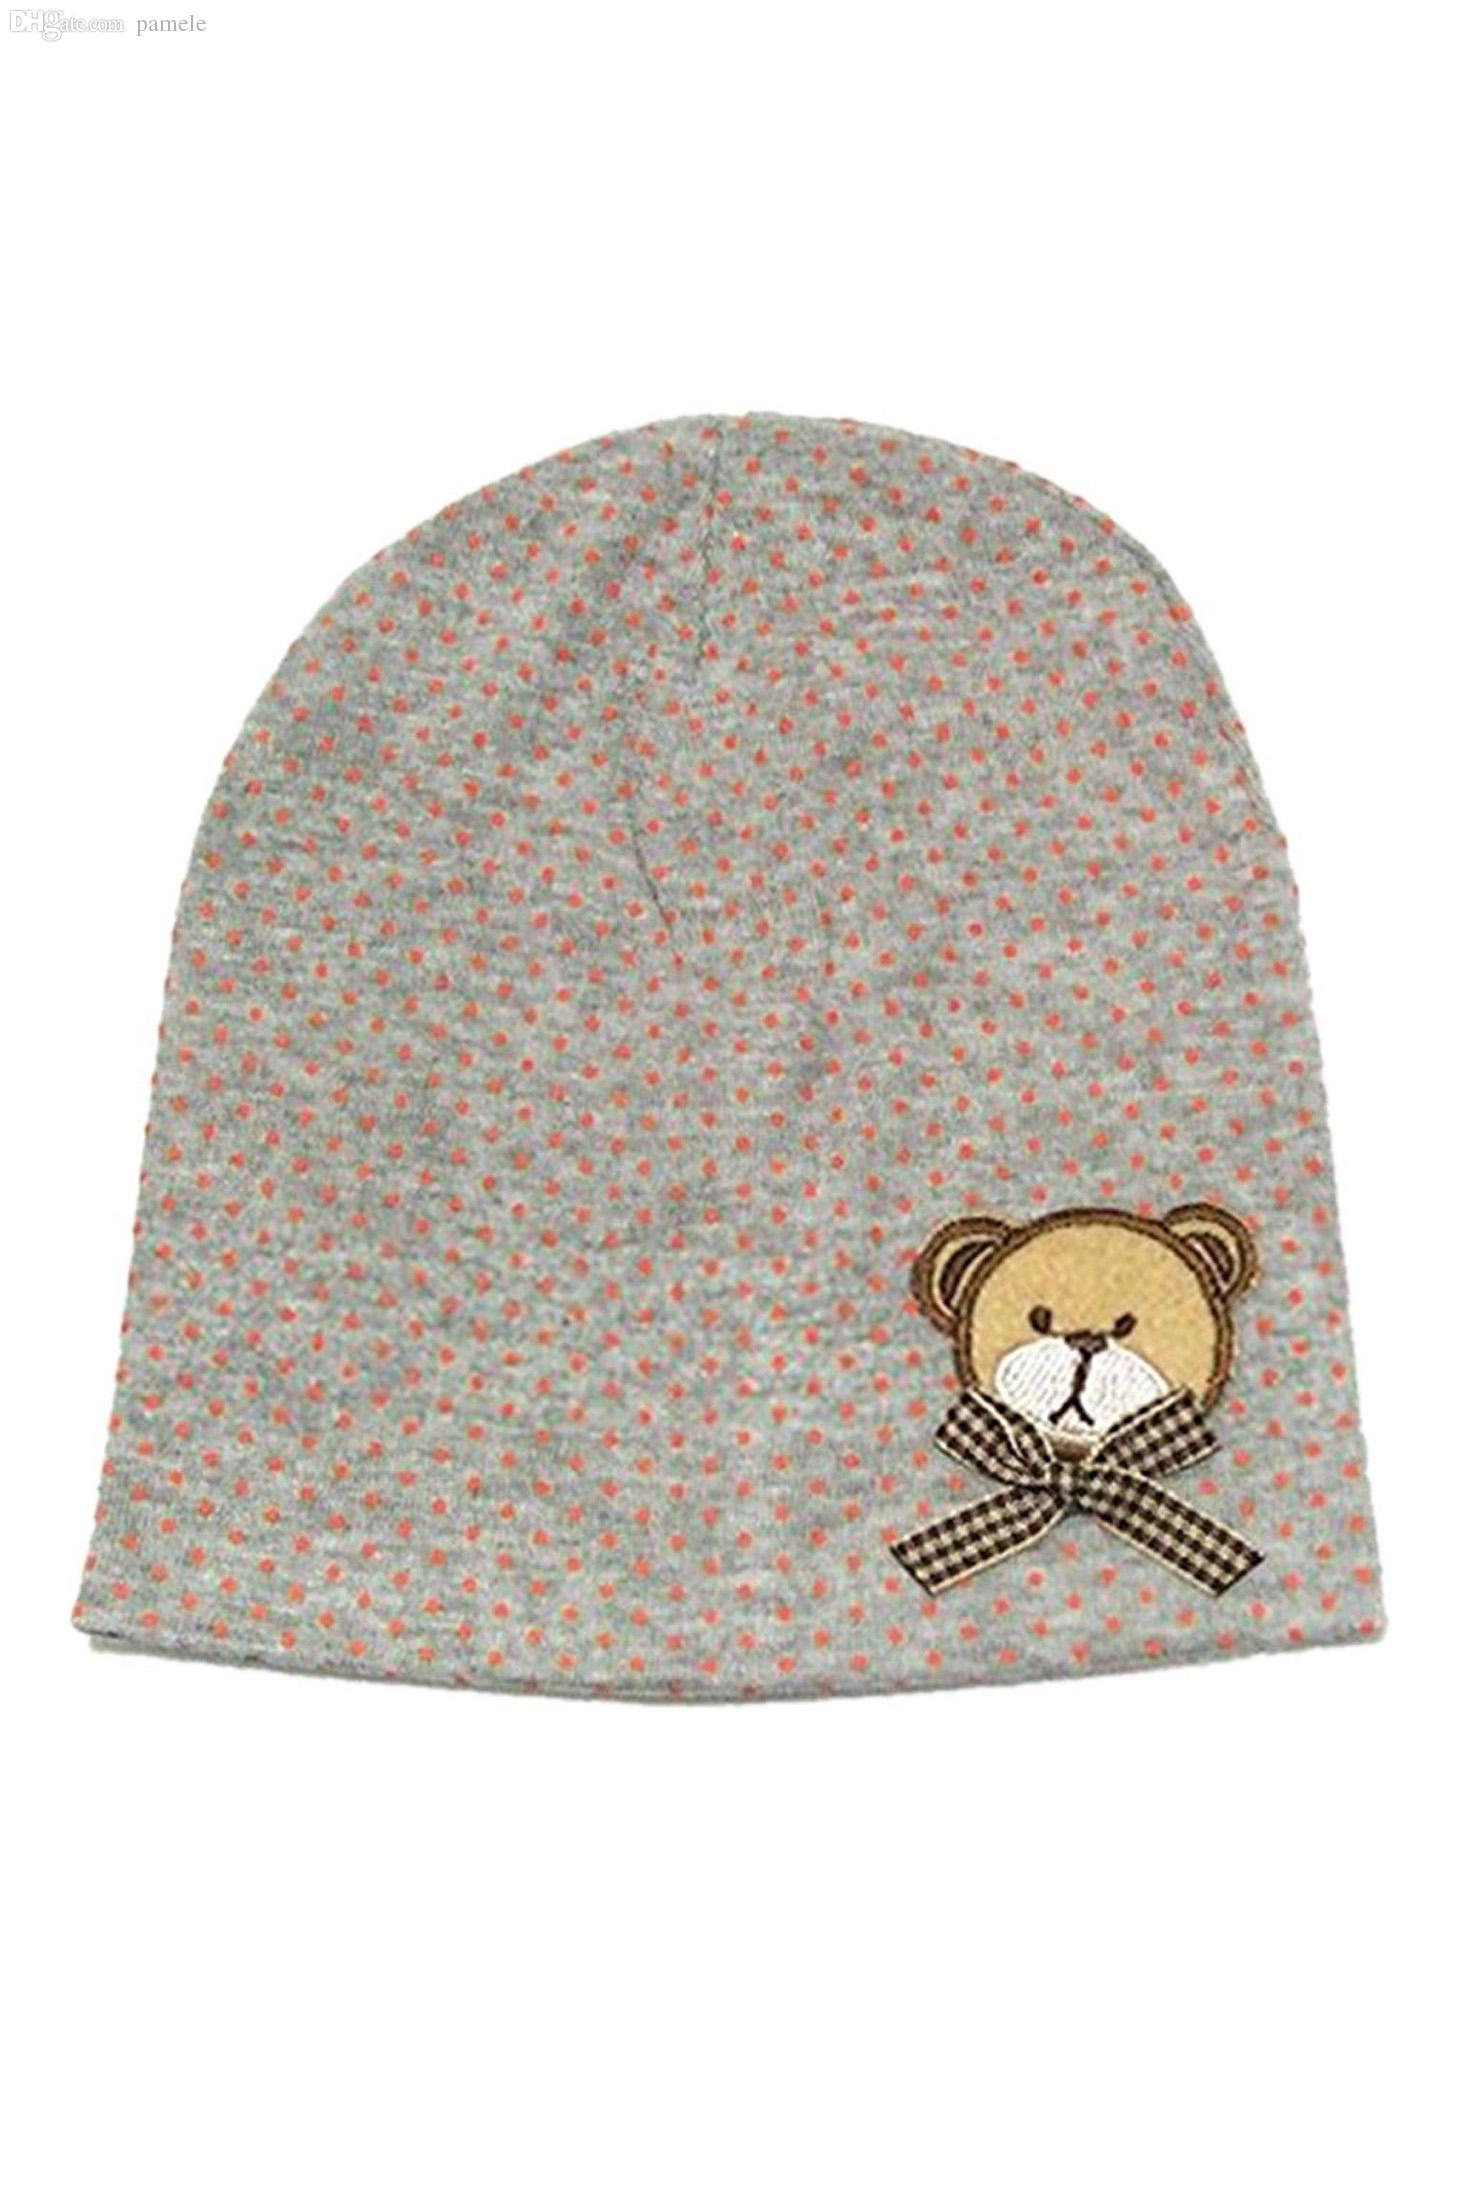 2019 Wholesale FS Hot Baby Girls Boys Winter Cap Dot Bear Cotton Blended Hat  Gray From Pamele 027f2af7d7a2